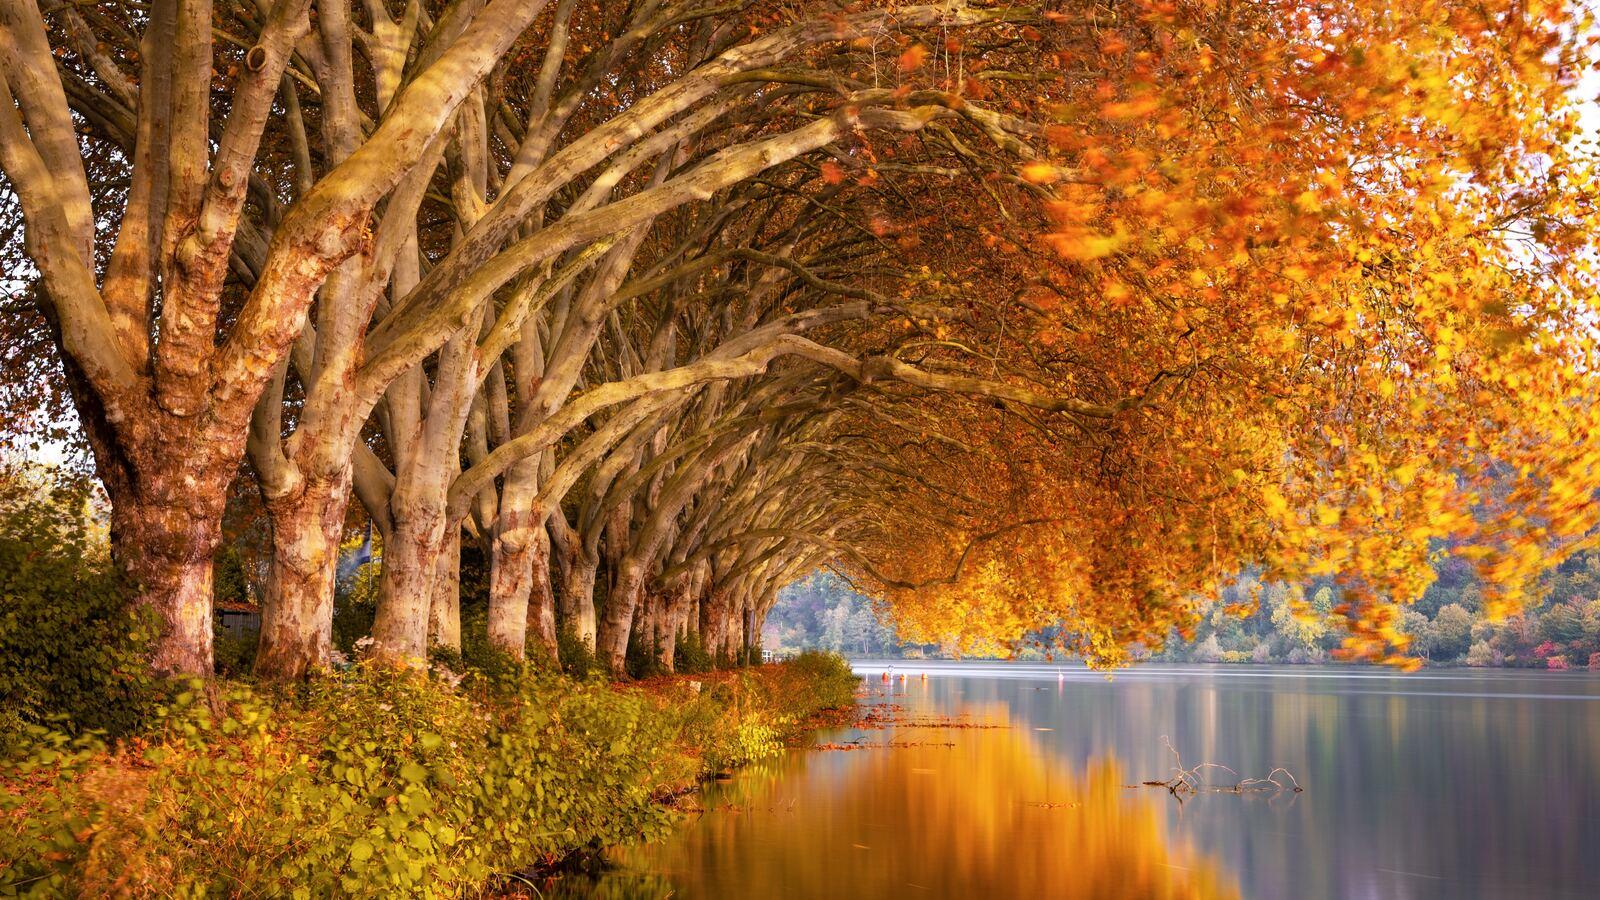 autumn-trees-orange-lake-5k-j6.jpg